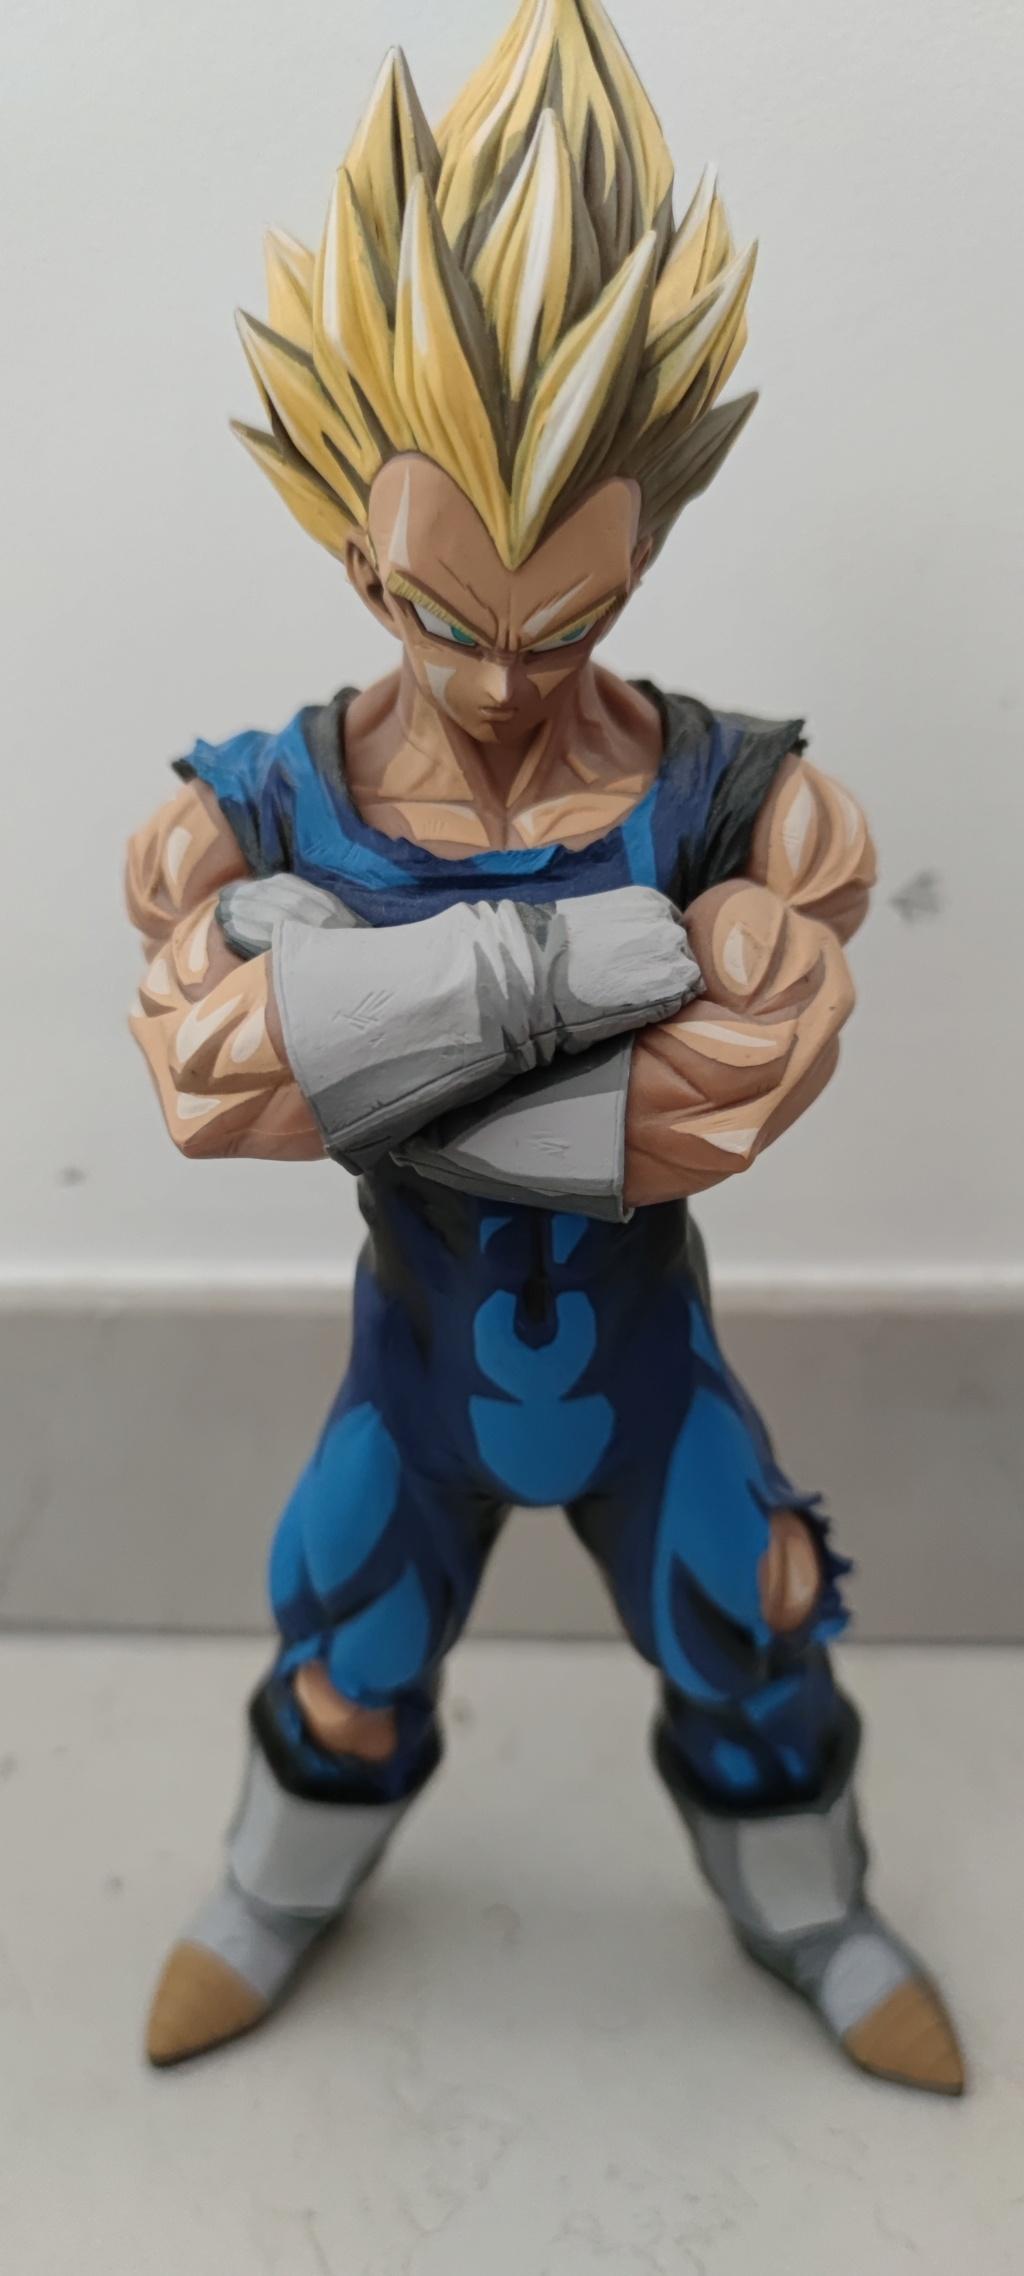 [VDS] Figurines Dragon Ball, One piece, Naruto, Megaman etc....  16162412